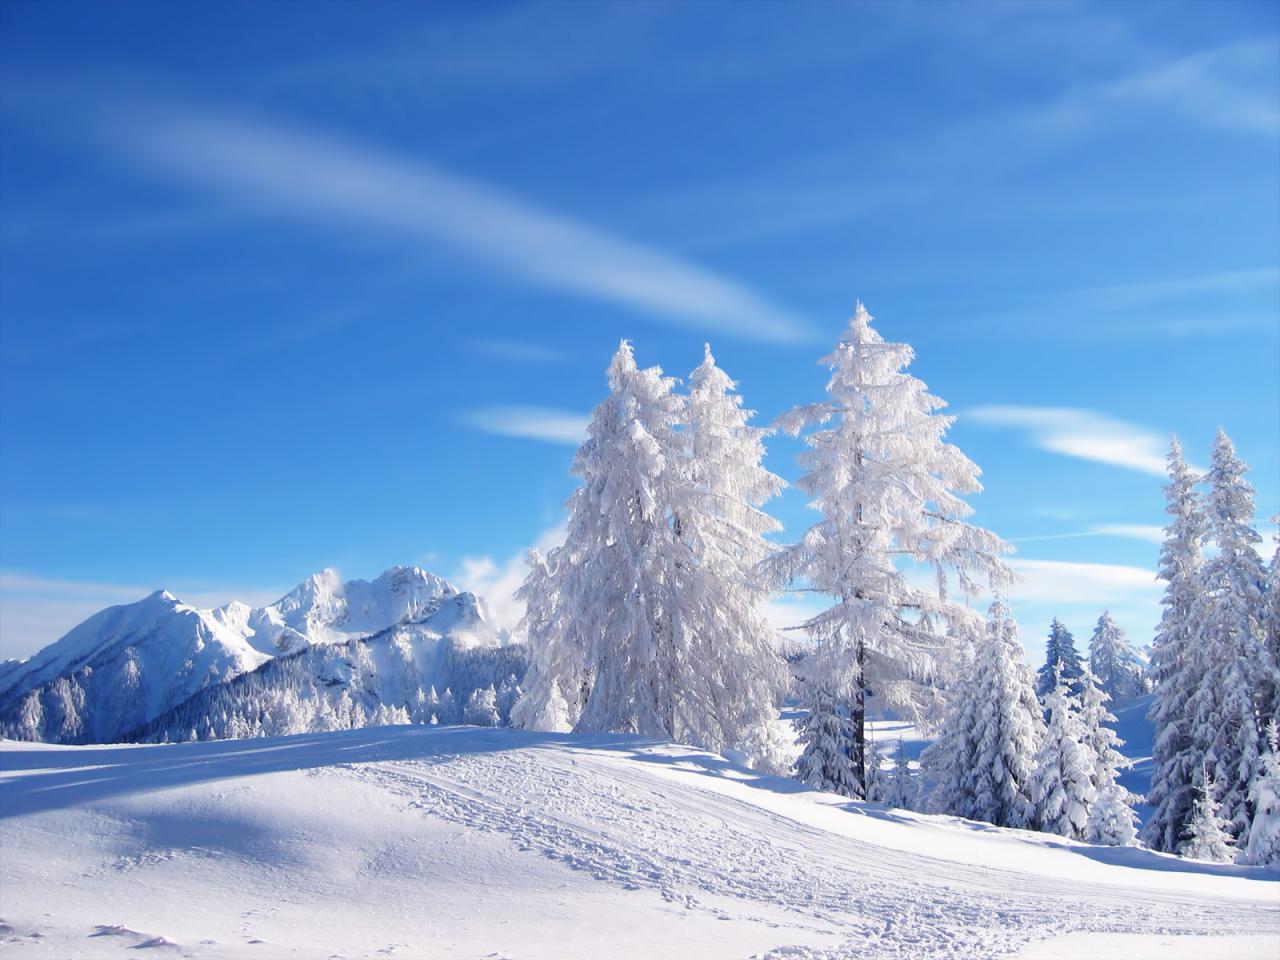 netwallpapersSeasonsWintersnow trees at winter desktop wallpaper 1280x960